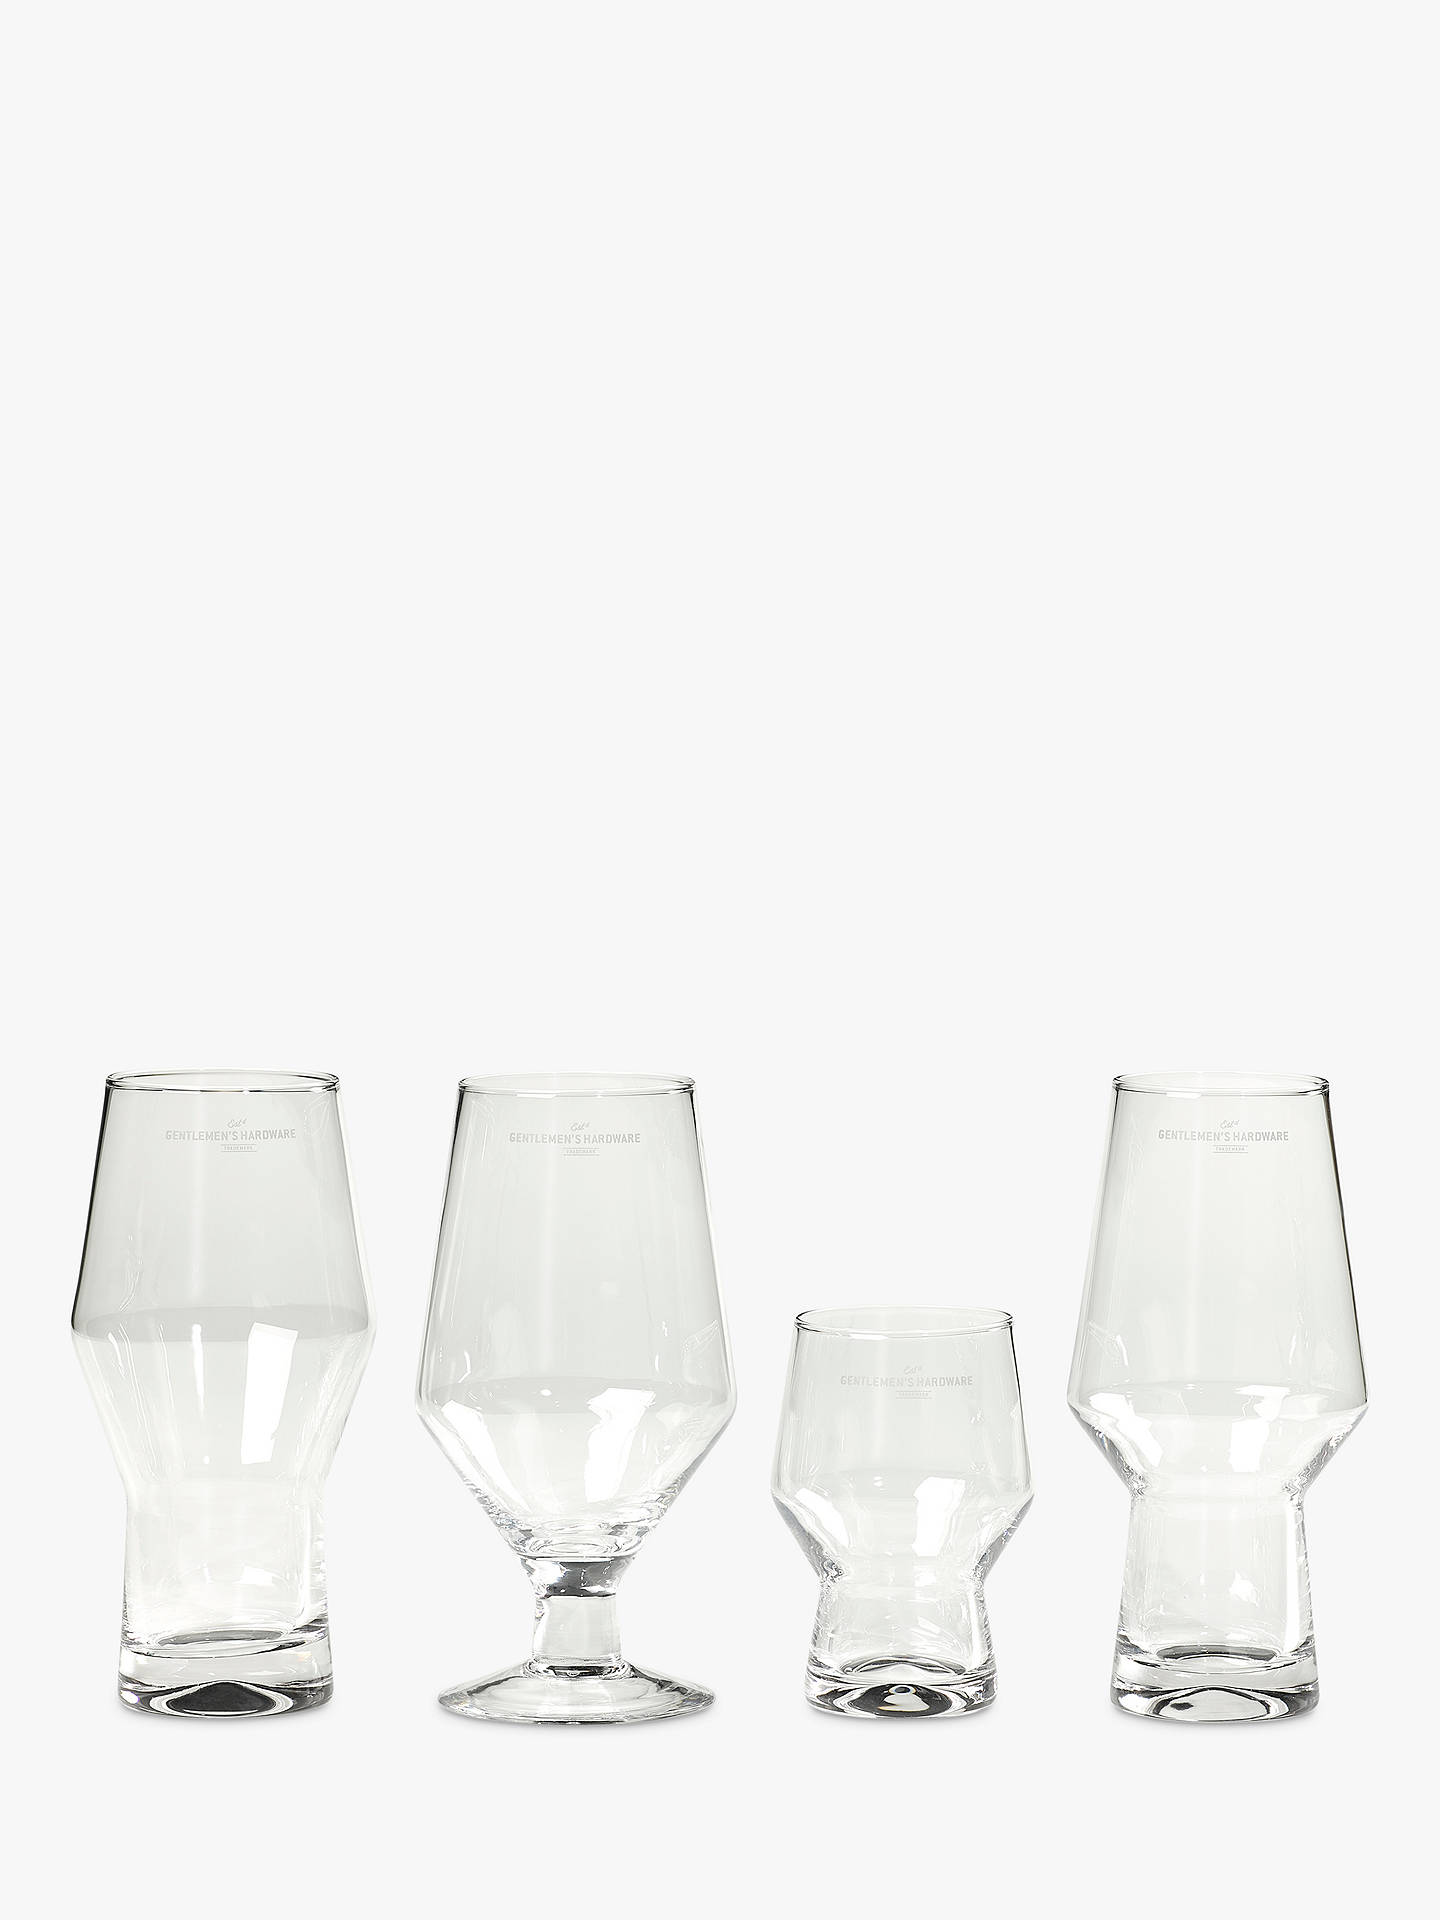 a93007b0e85 BuyGentlemen s Hardware Craft Beer Glasses